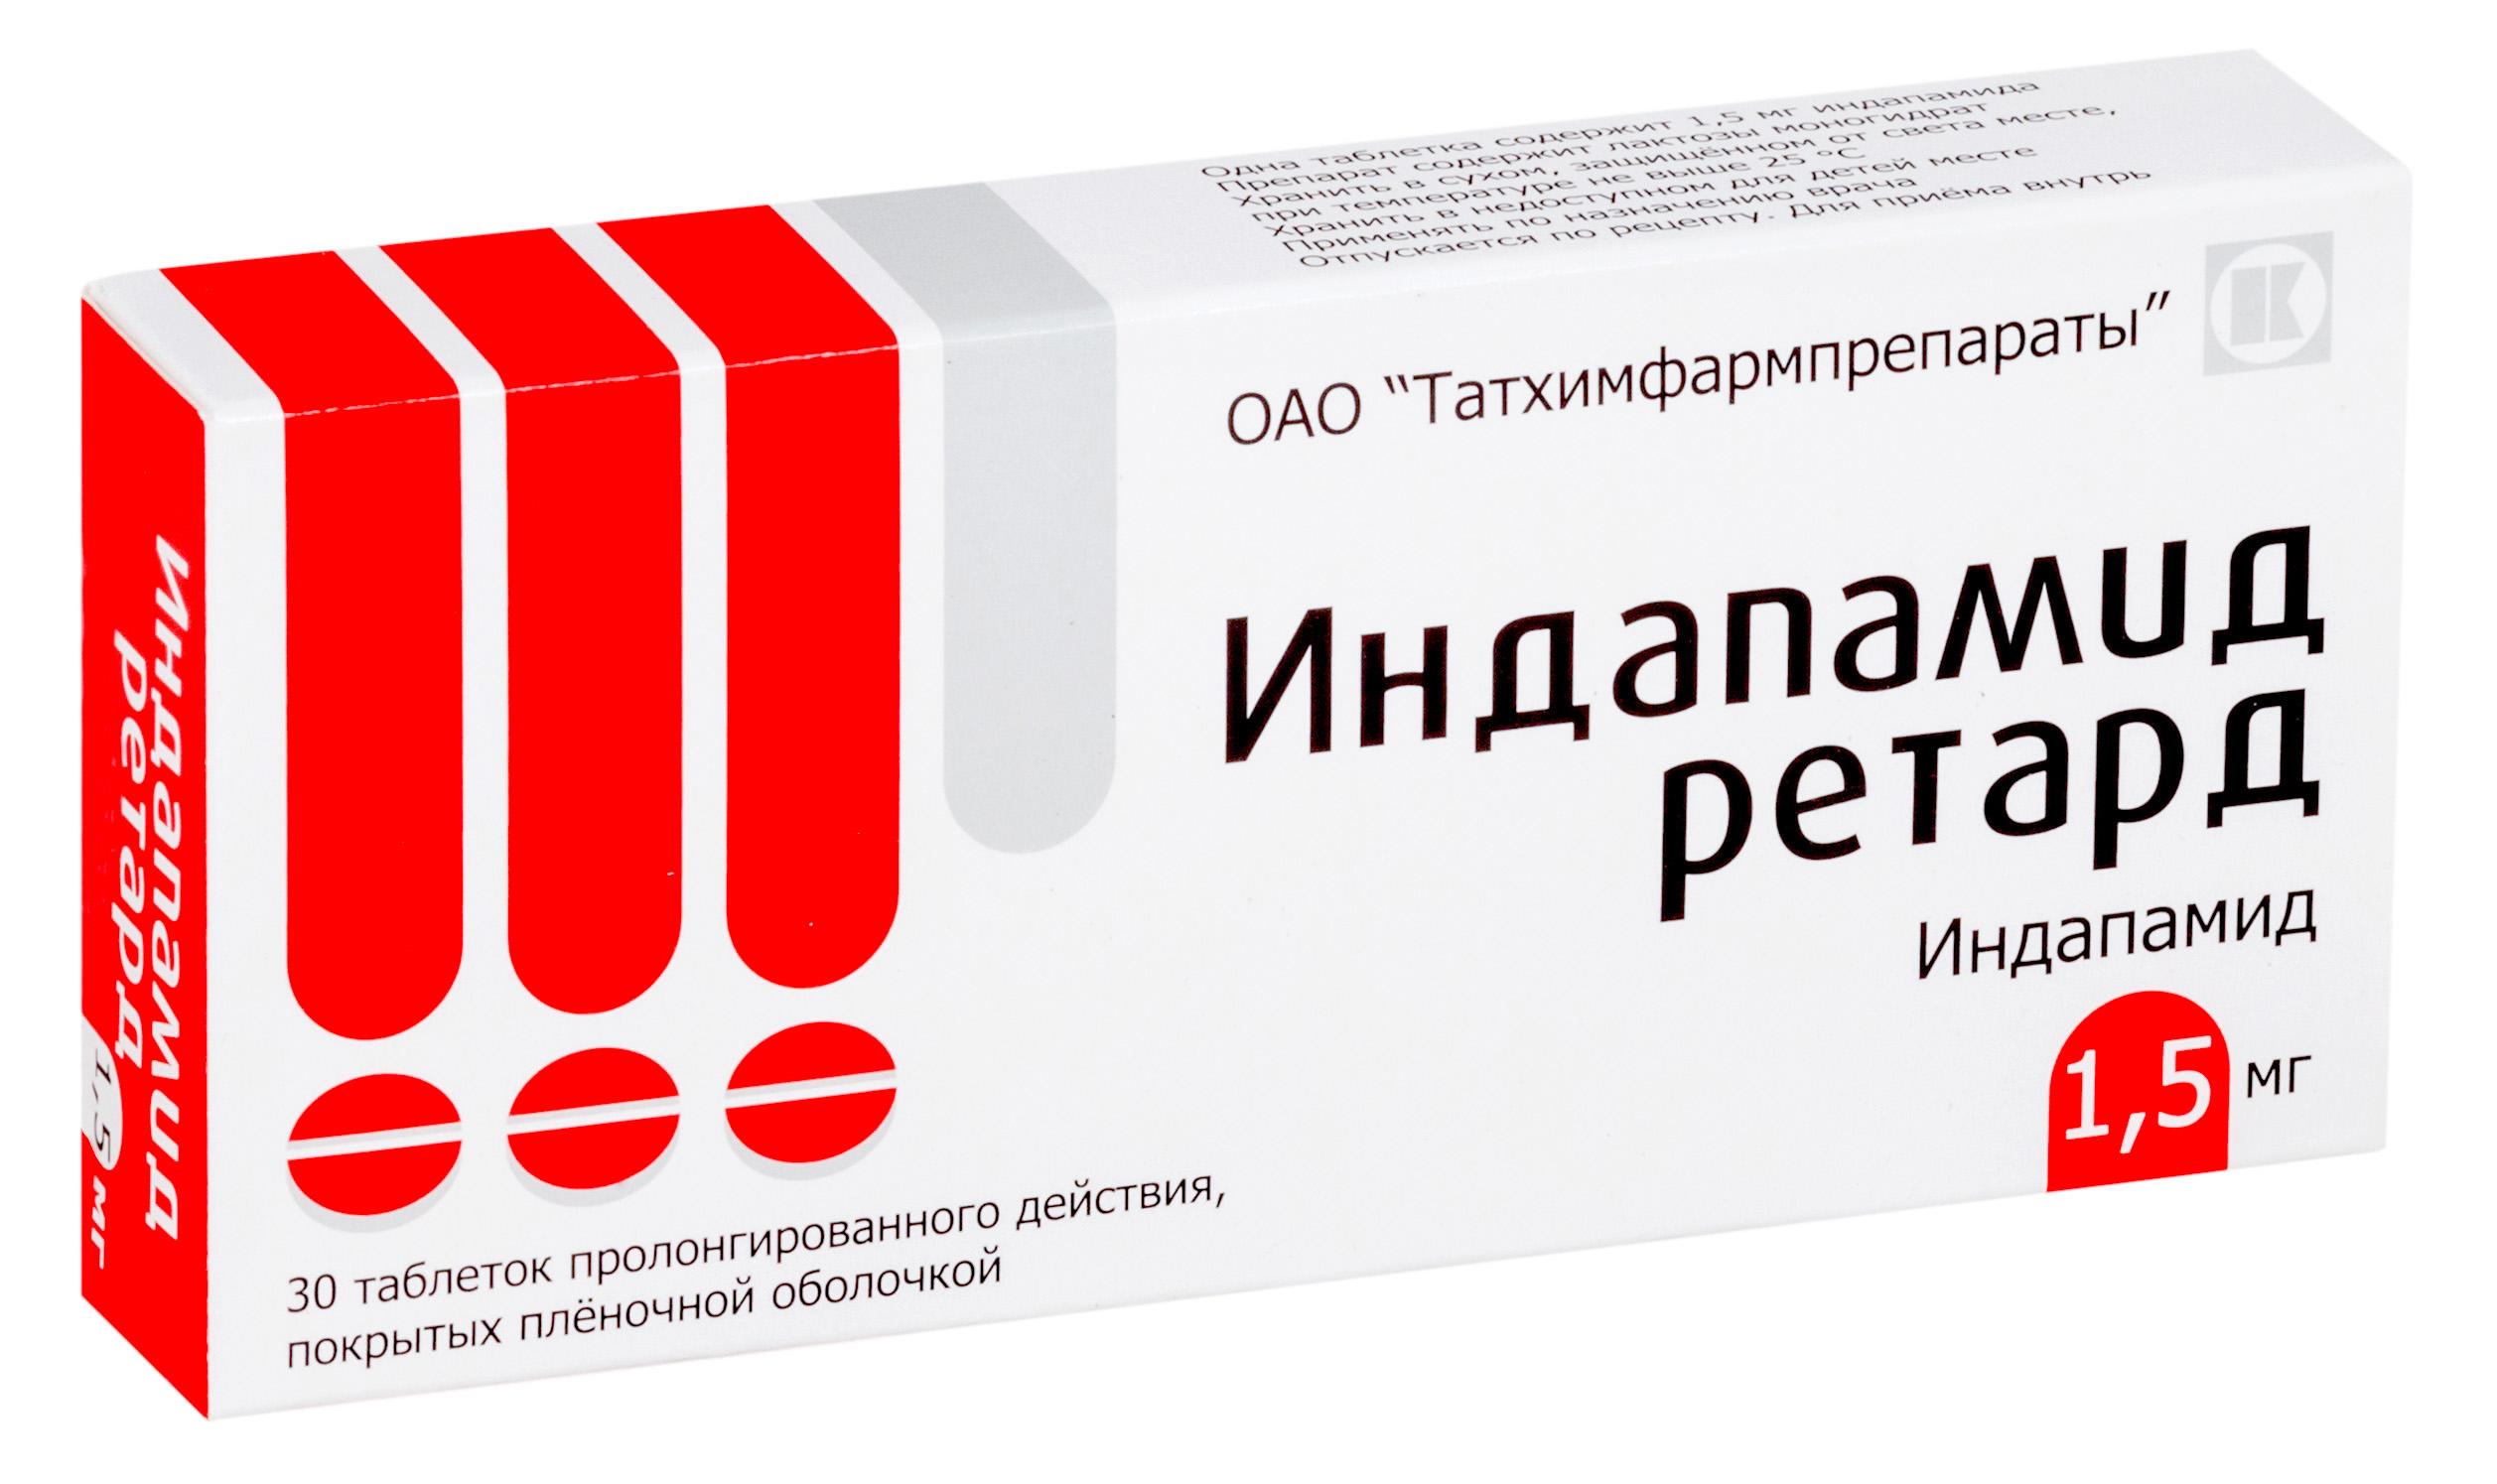 Индапамид ретард таб. пролонг. д-я п/о плен. 1,5мг №30